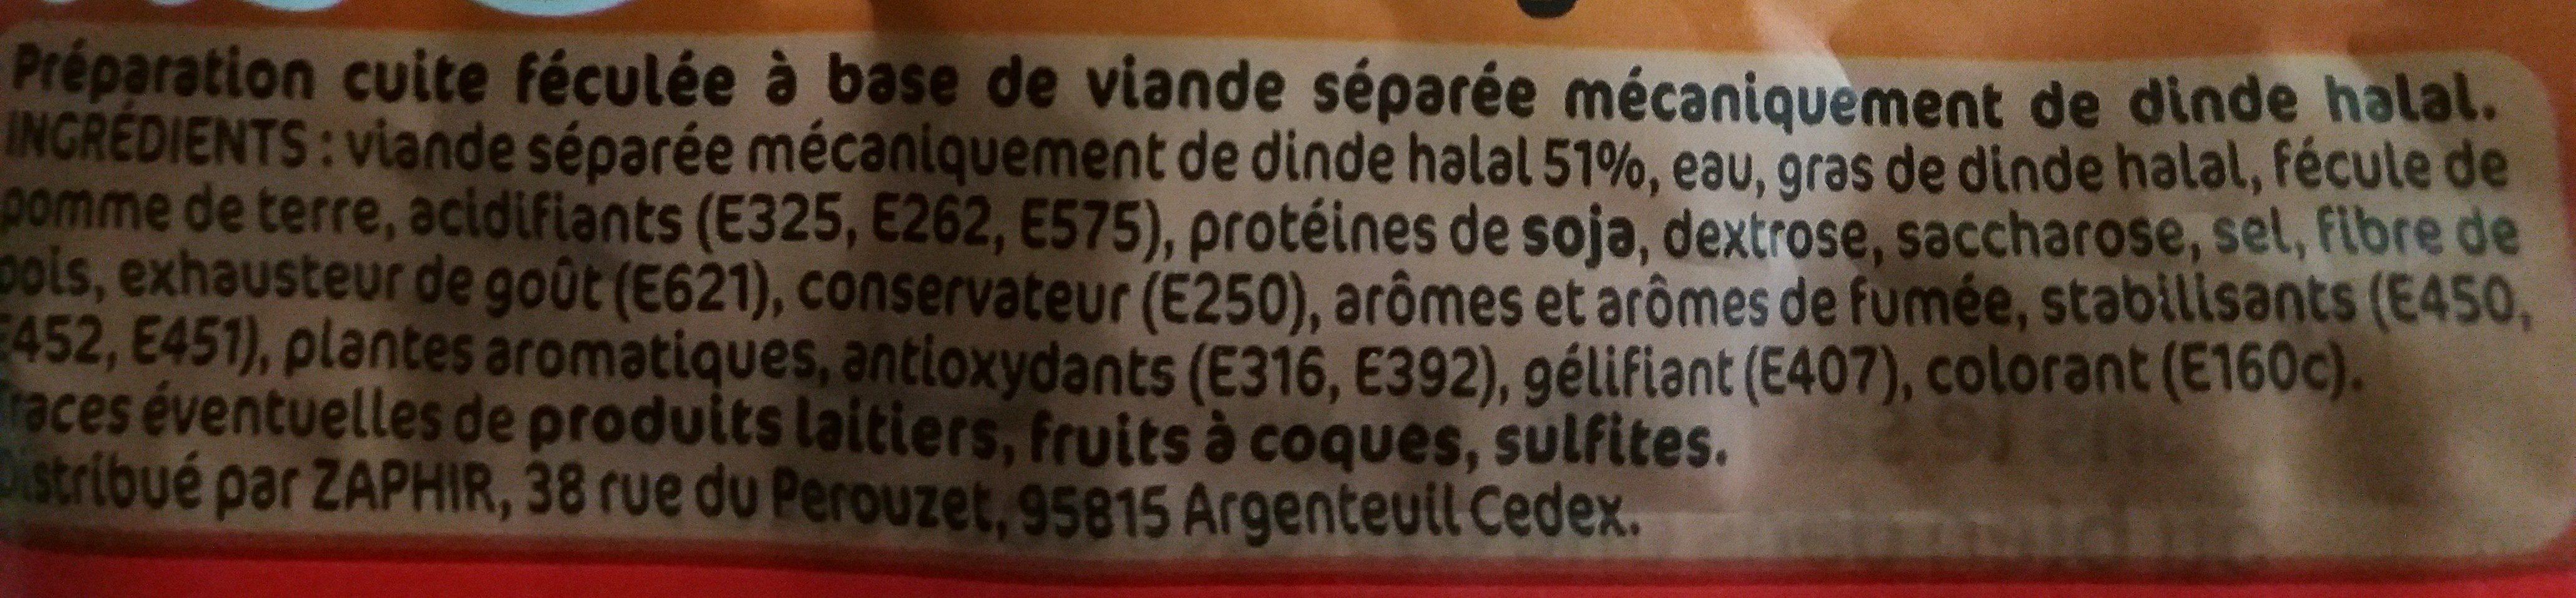 Déliss' Original - Ingredients - fr